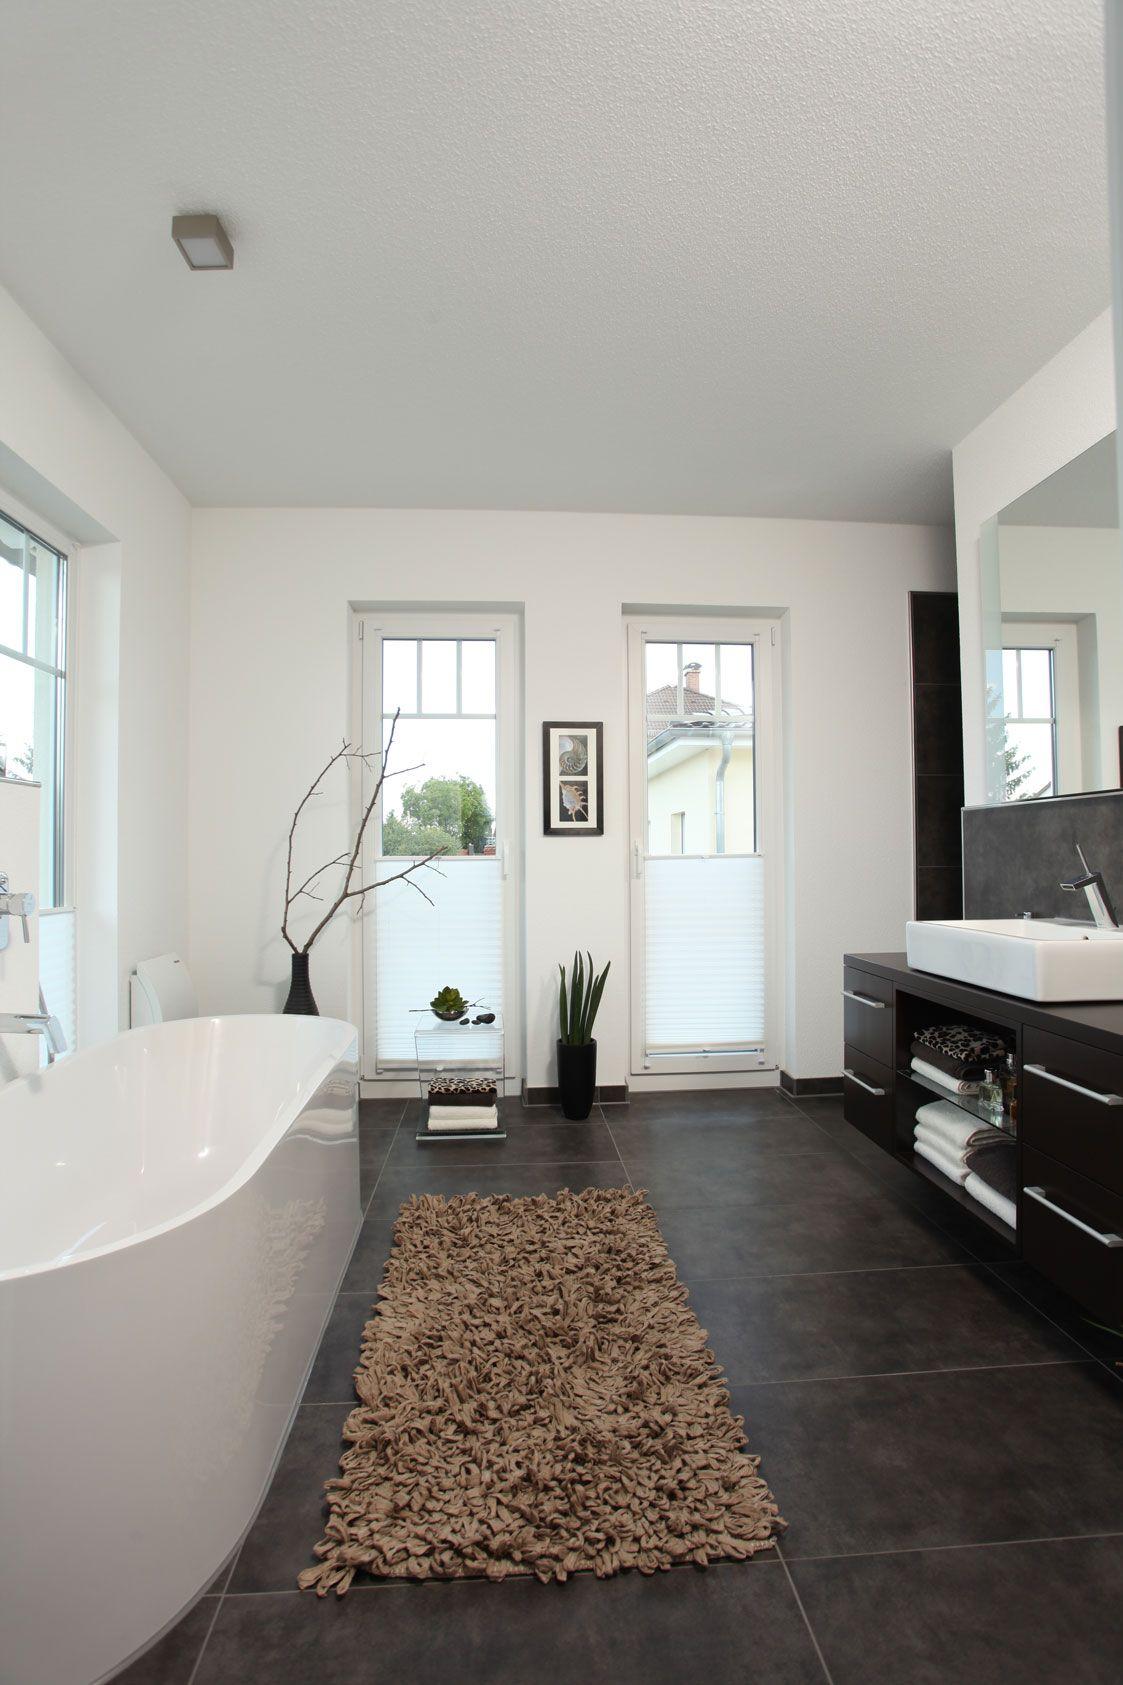 badezimmer mit freistehender badewanne stadtvilla markant nobel pinterest freistehende. Black Bedroom Furniture Sets. Home Design Ideas